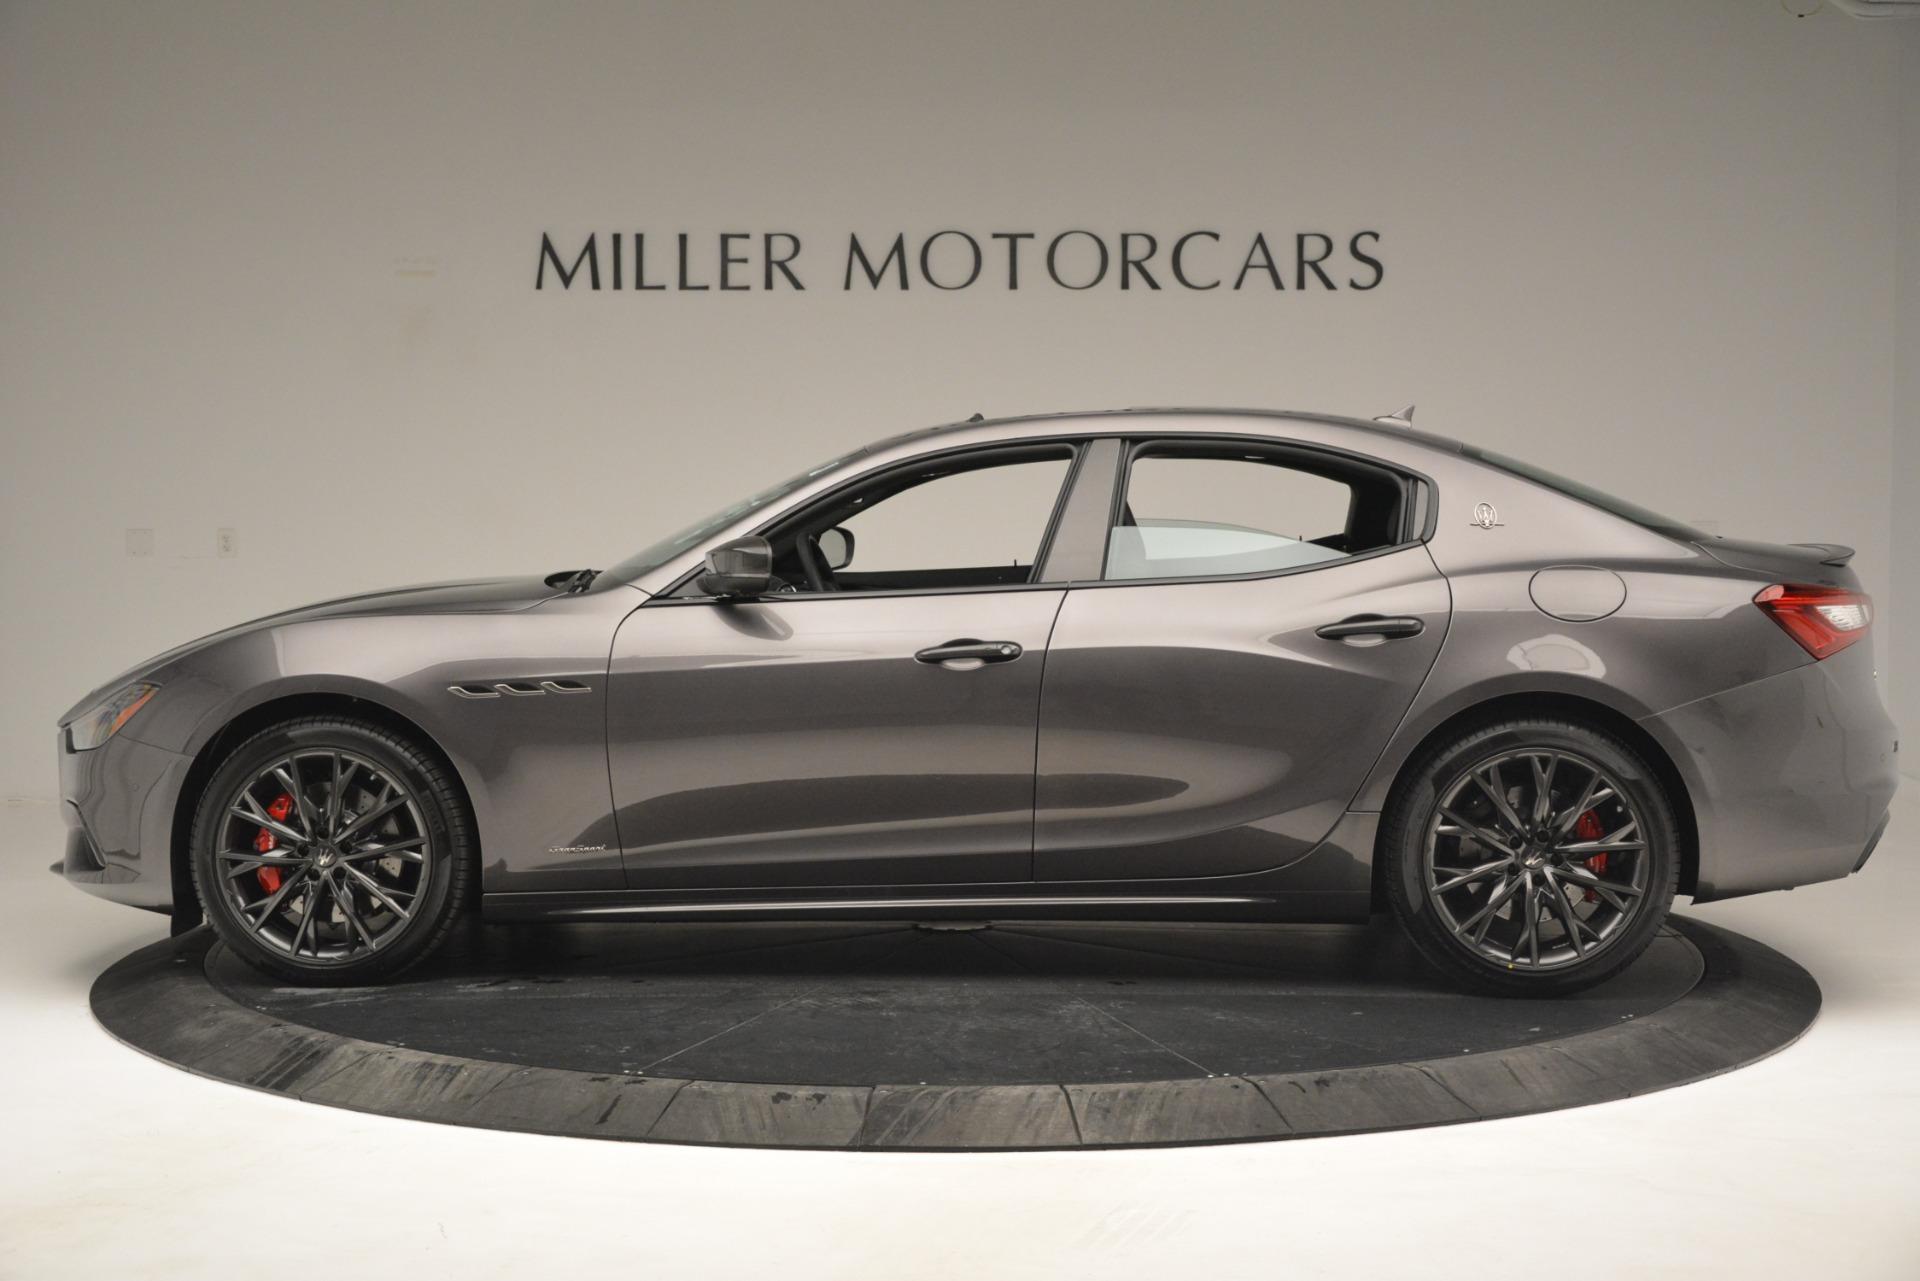 New 2019 Maserati Ghibli S Q4 GranSport For Sale In Westport, CT 2925_p4